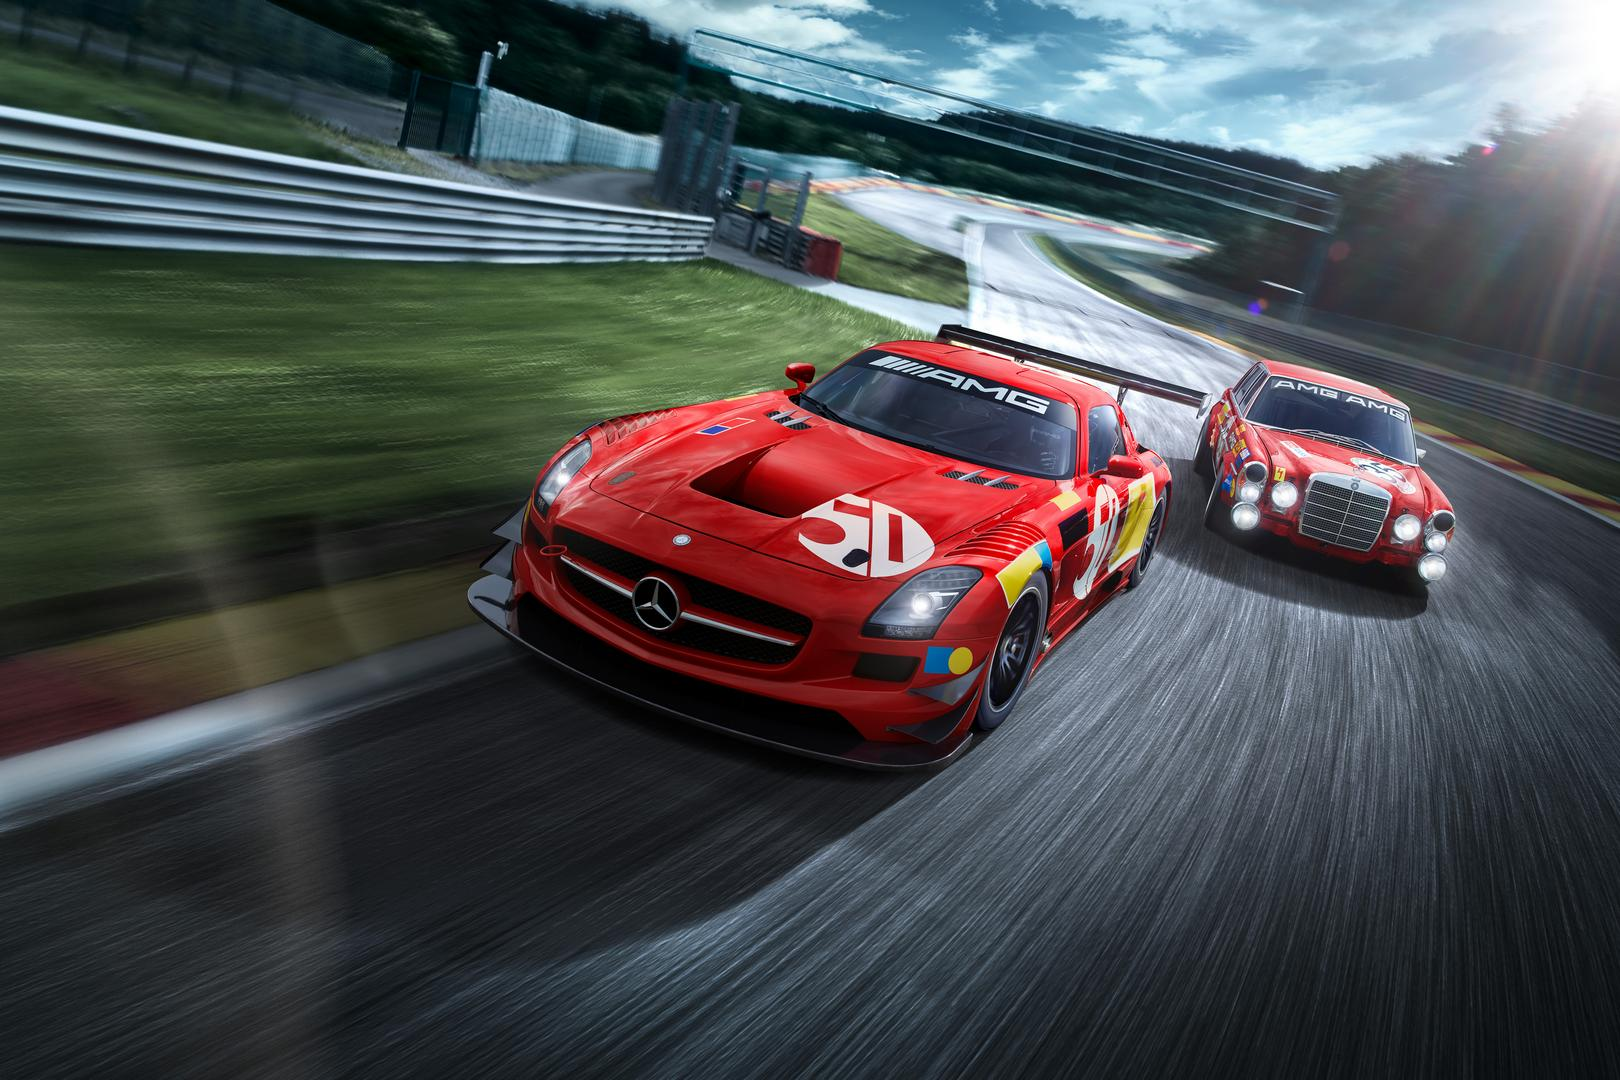 2021 SLS AMG GT3